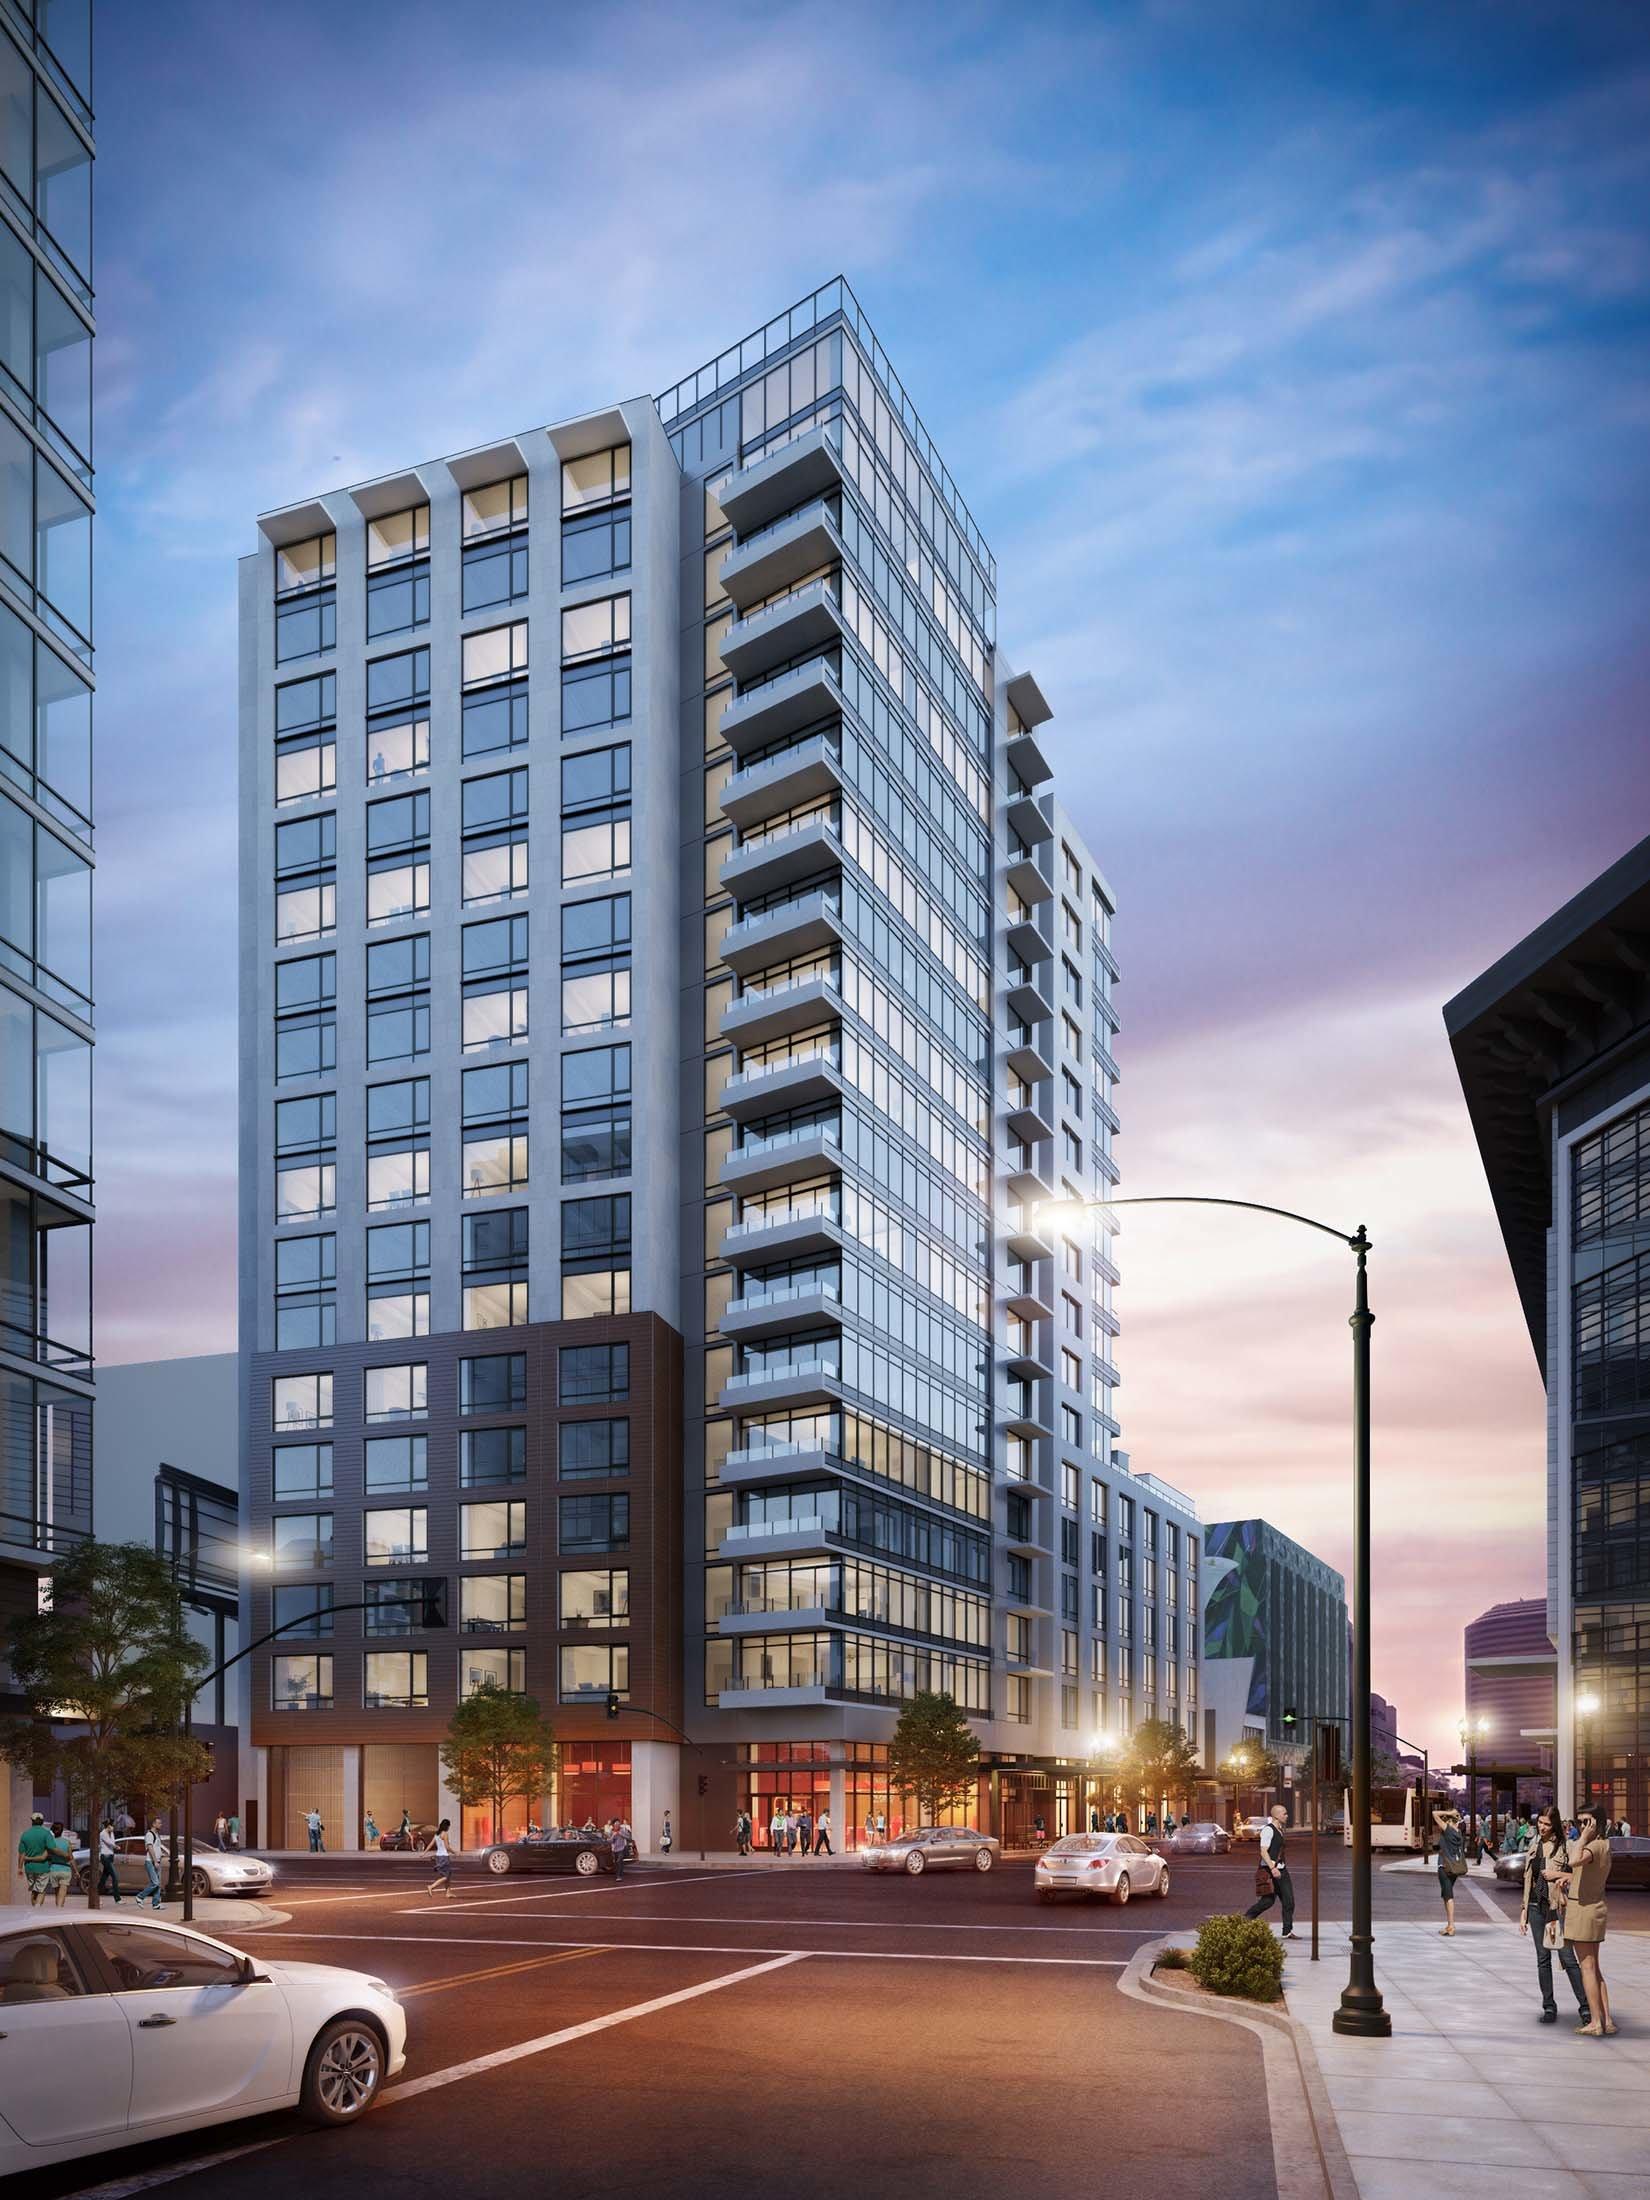 2016 Telegraph Oakland Apartment Building Exterior Rendering Design Architecture by brick.